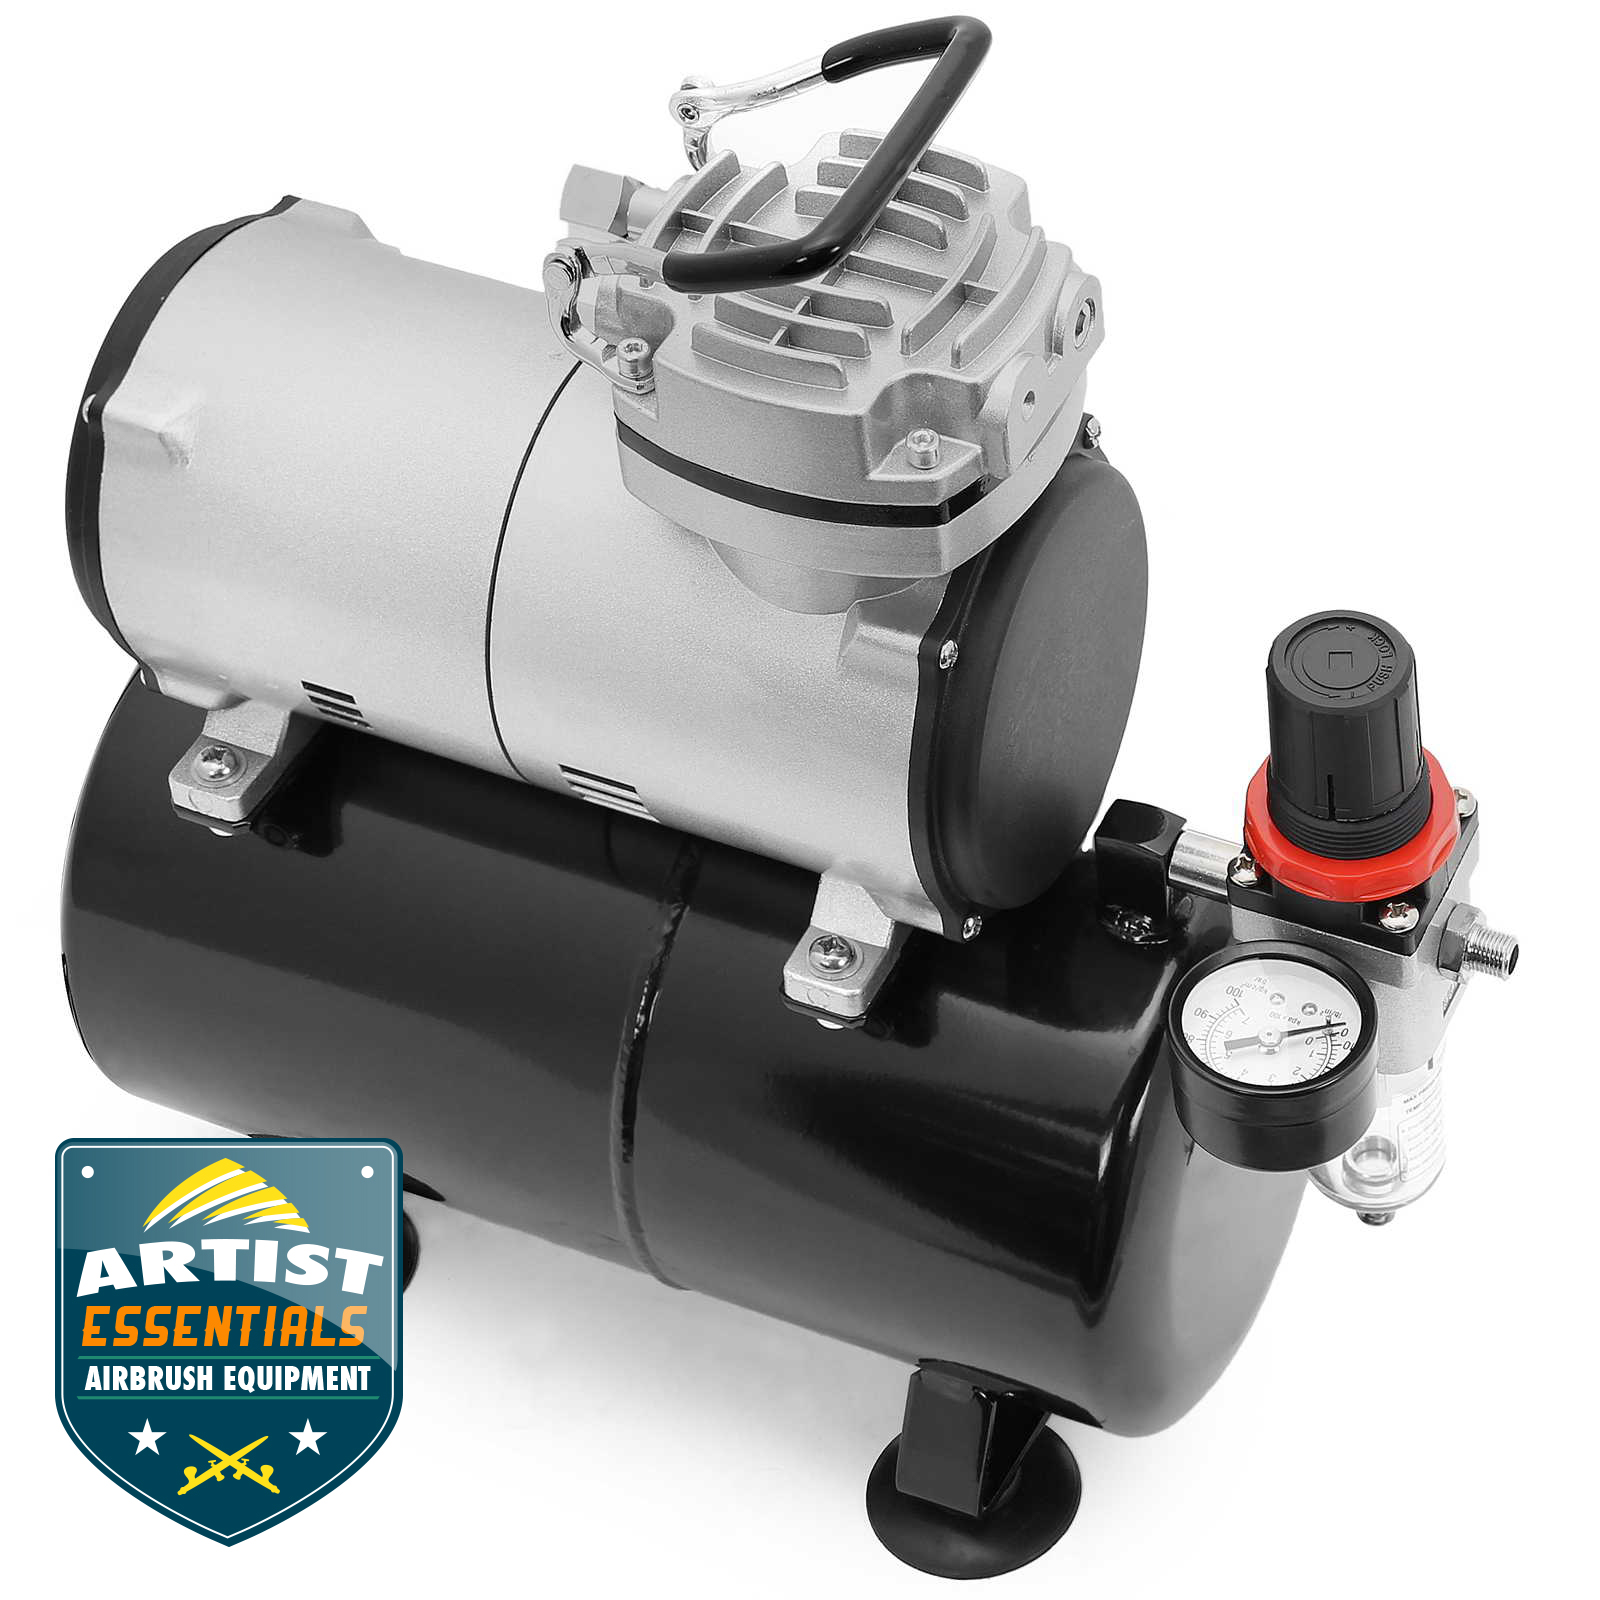 Air Compressor Mark Manual 2010 Hyundai Fuse Box Diagram Accent Engine